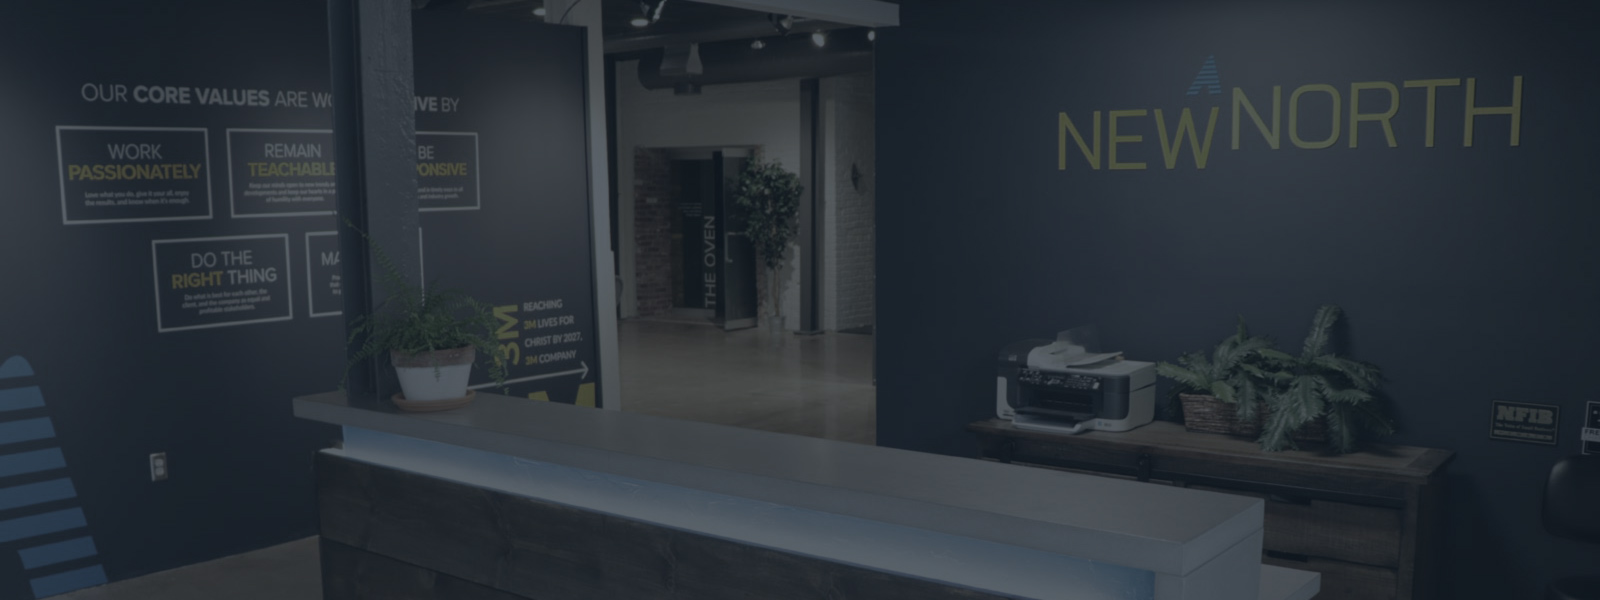 nn-office-space-4